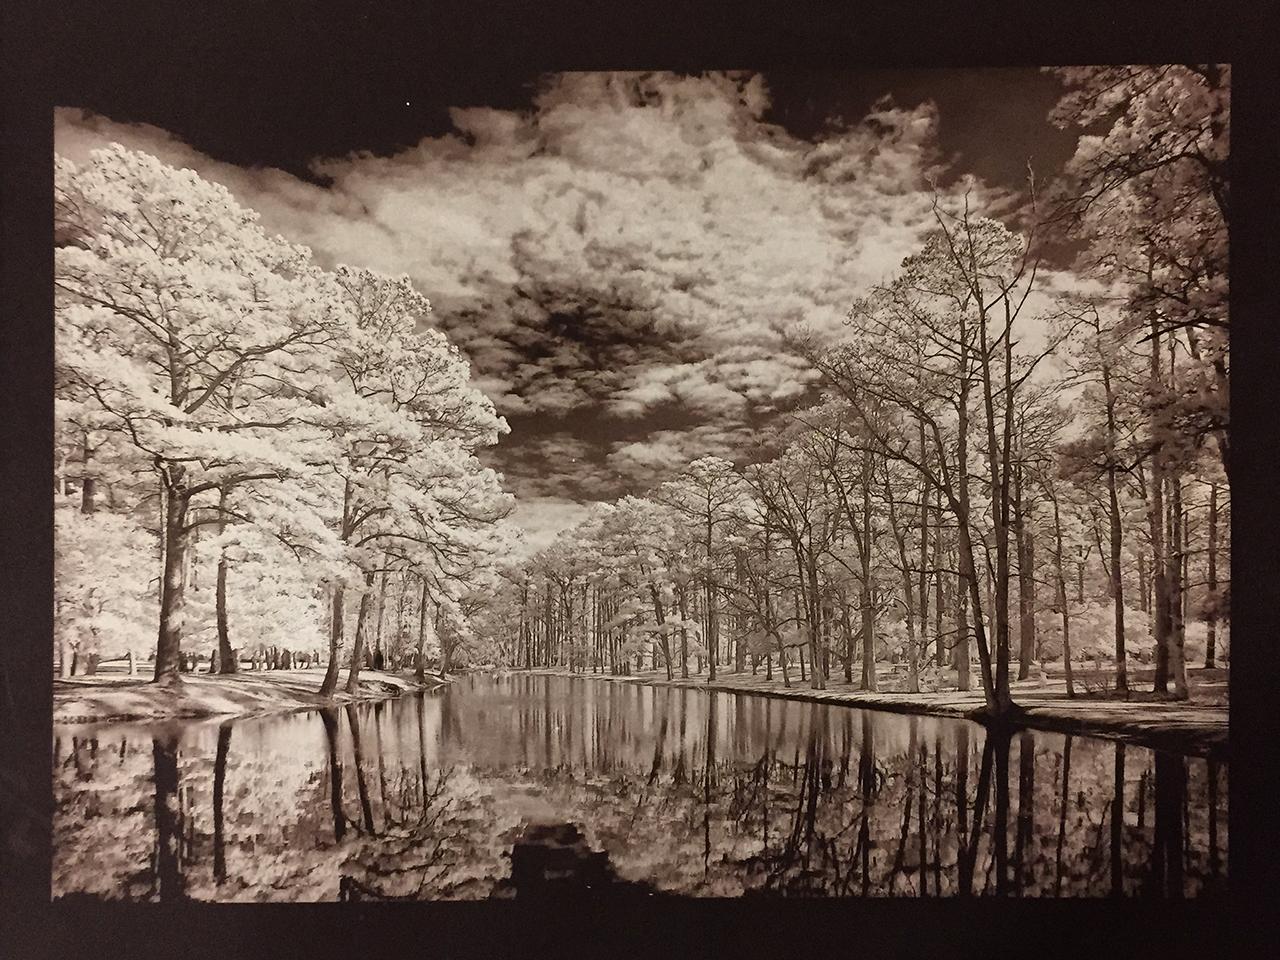 vdb-oak-reflections-in-infrared-3-min-exp.jpg